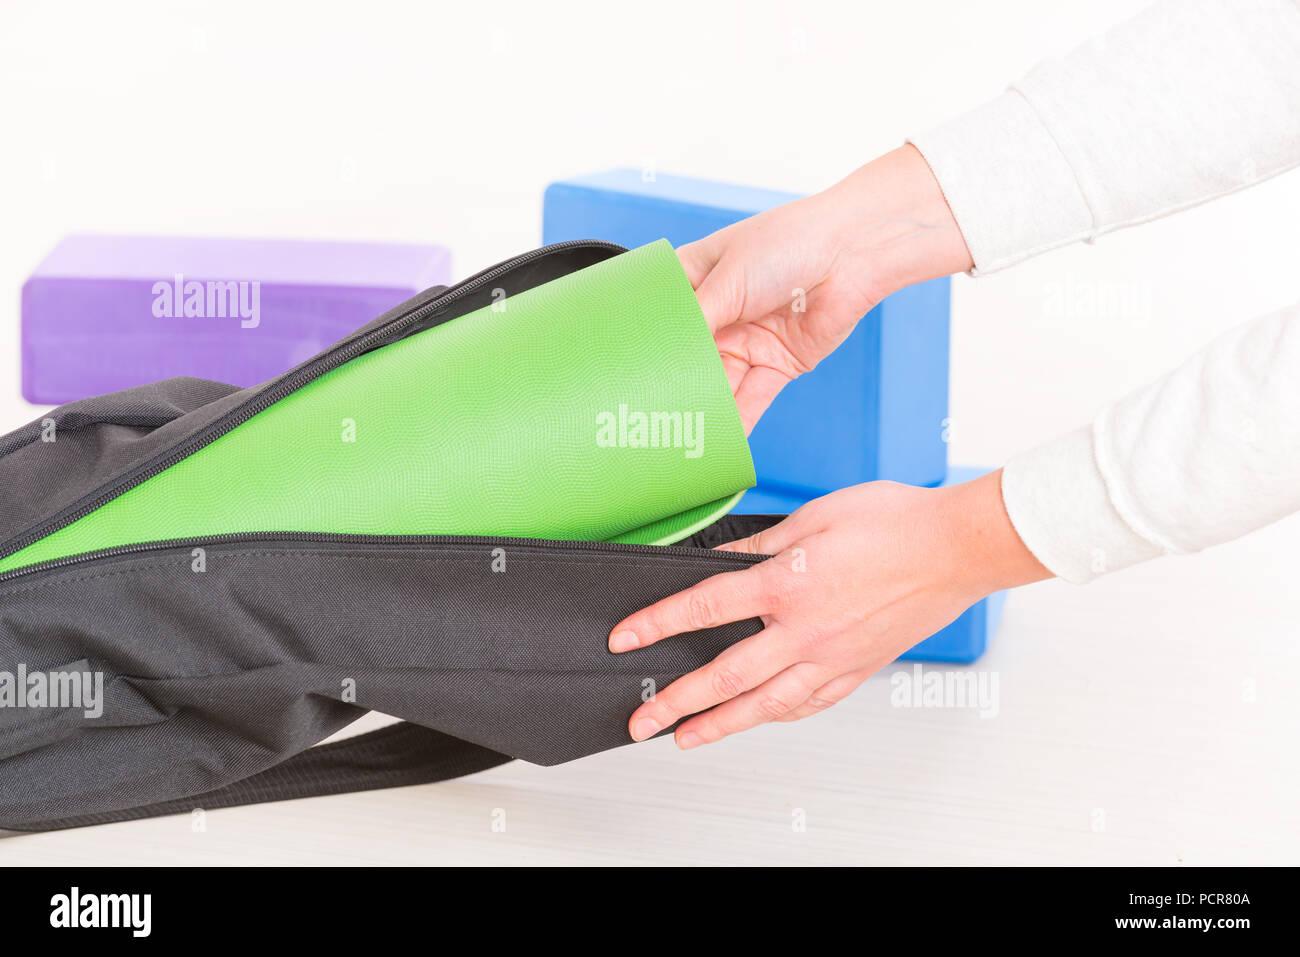 Putting a yoga mat inside a special yoga bag Stock Photo  214411466 ... 31406171a8155